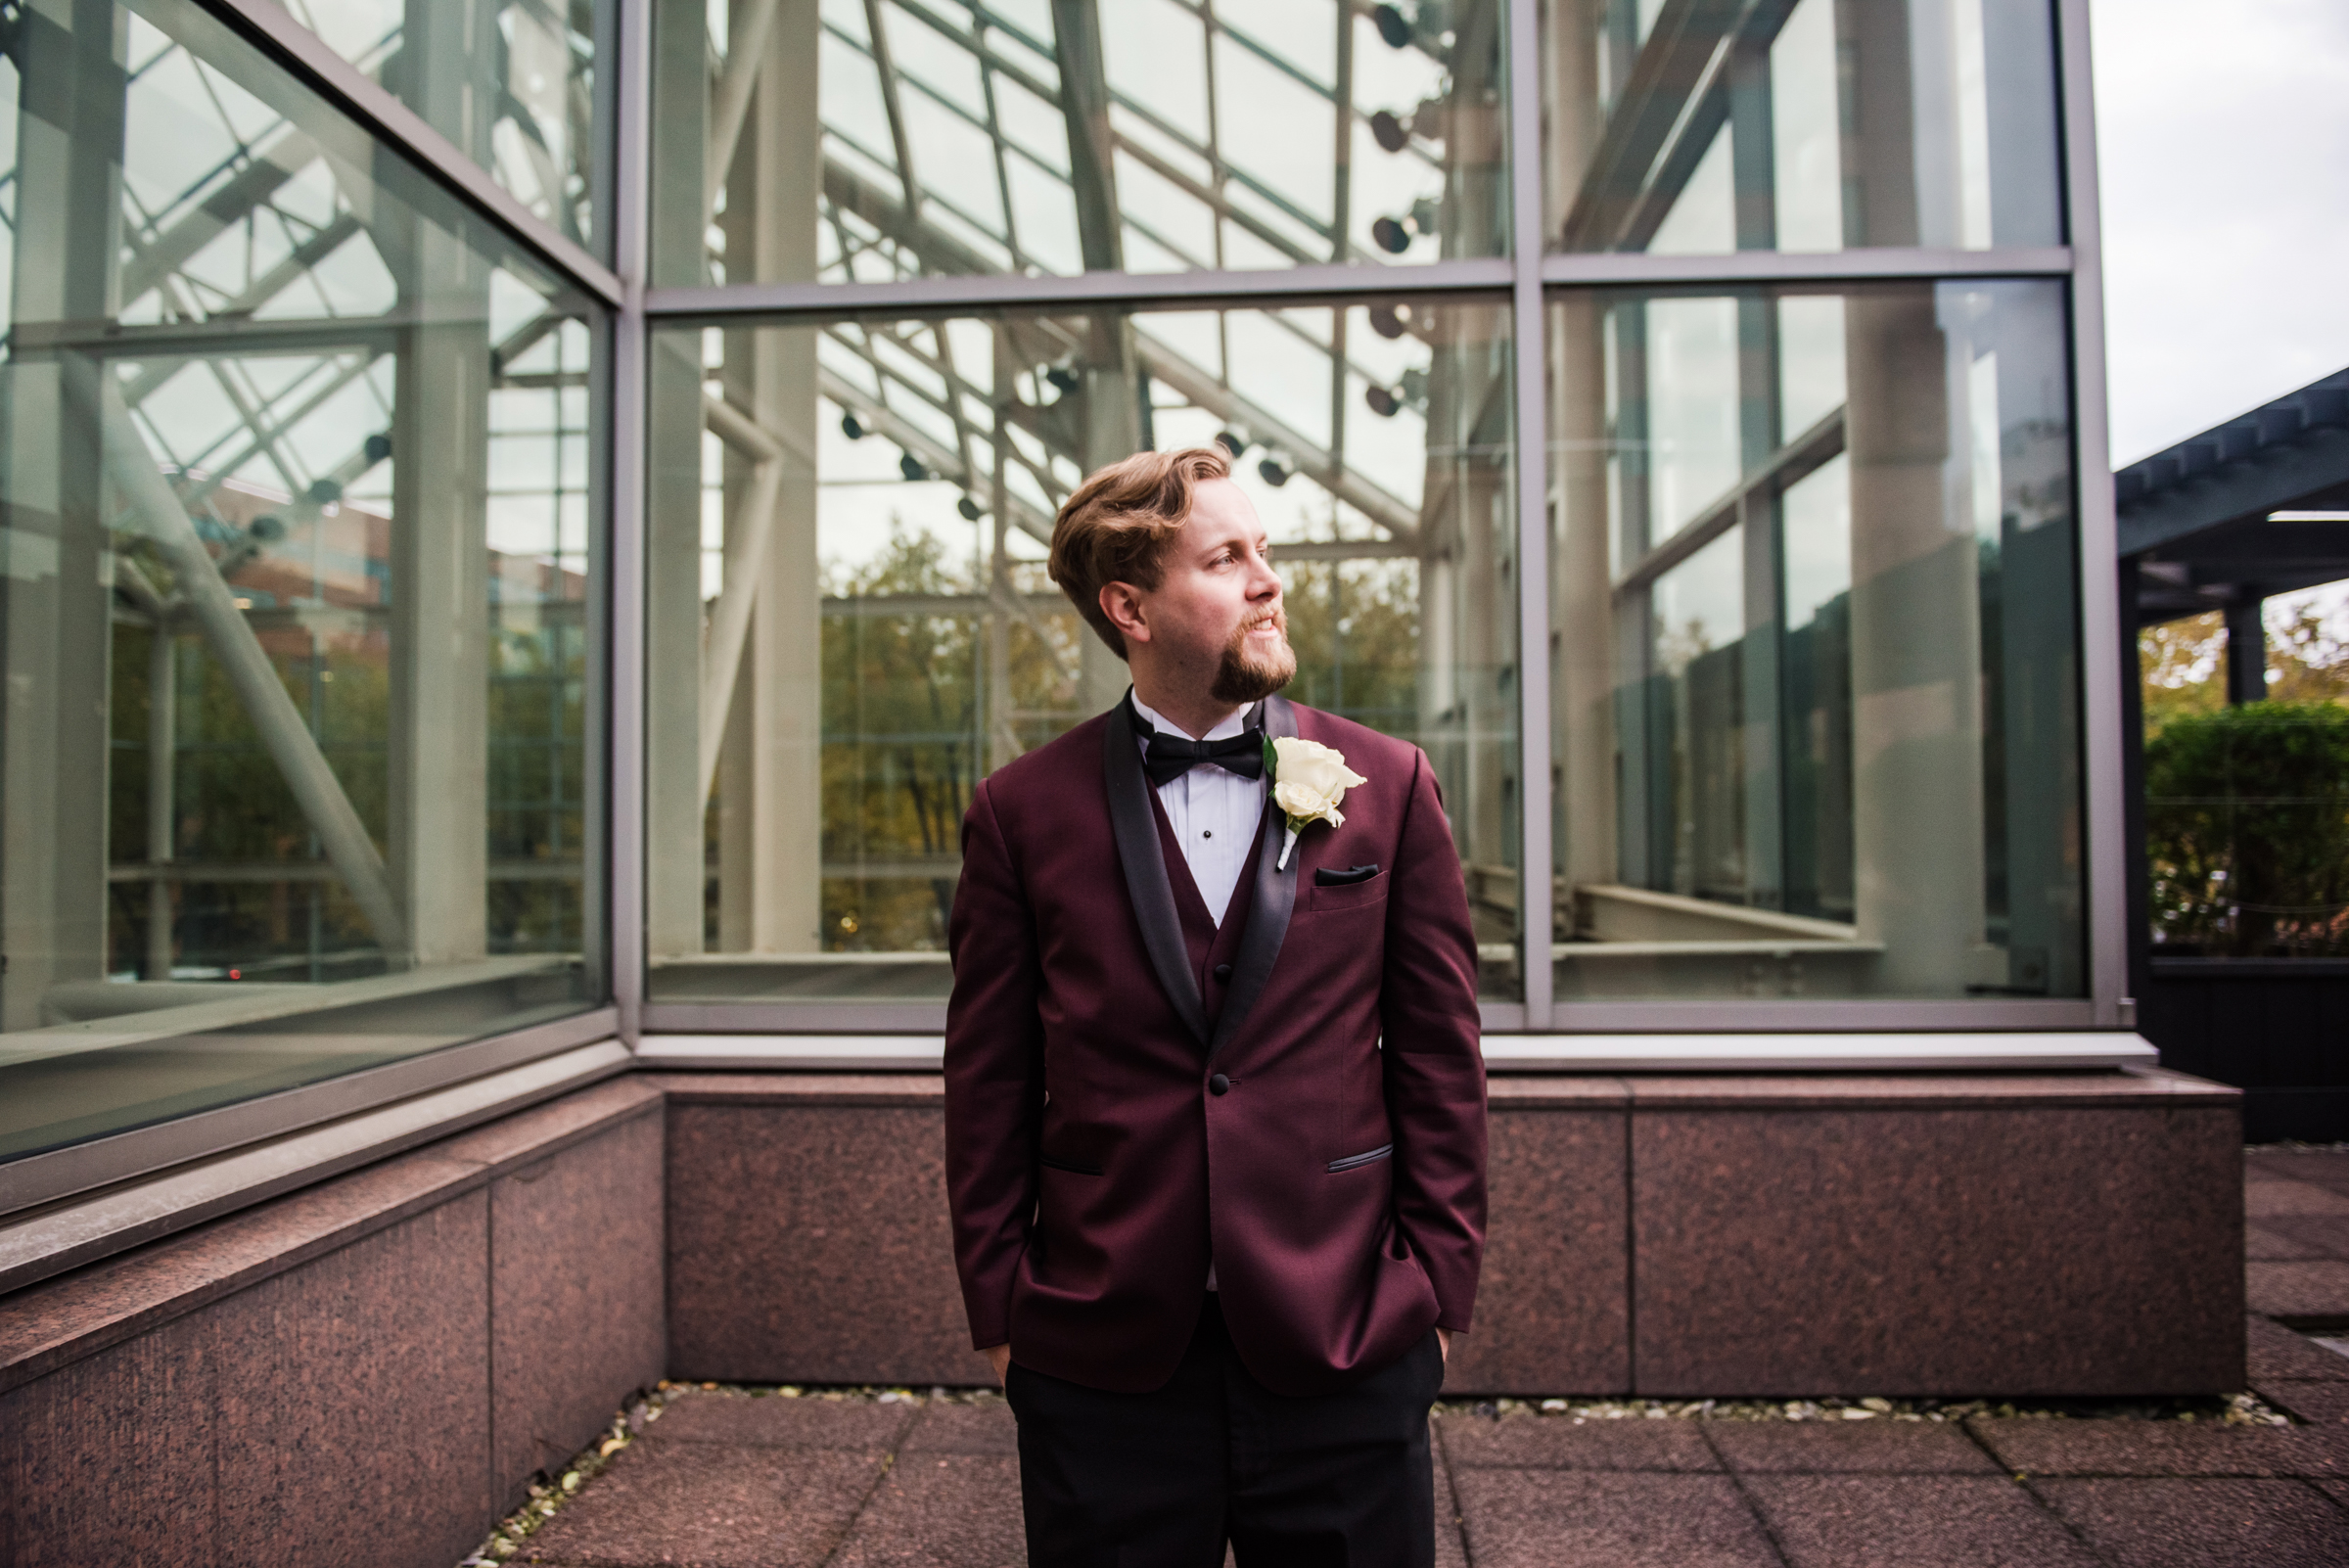 Wintergarden_by_Monroes_Rochester_Wedding_JILL_STUDIO_Rochester_NY_Photographer_173332.jpg